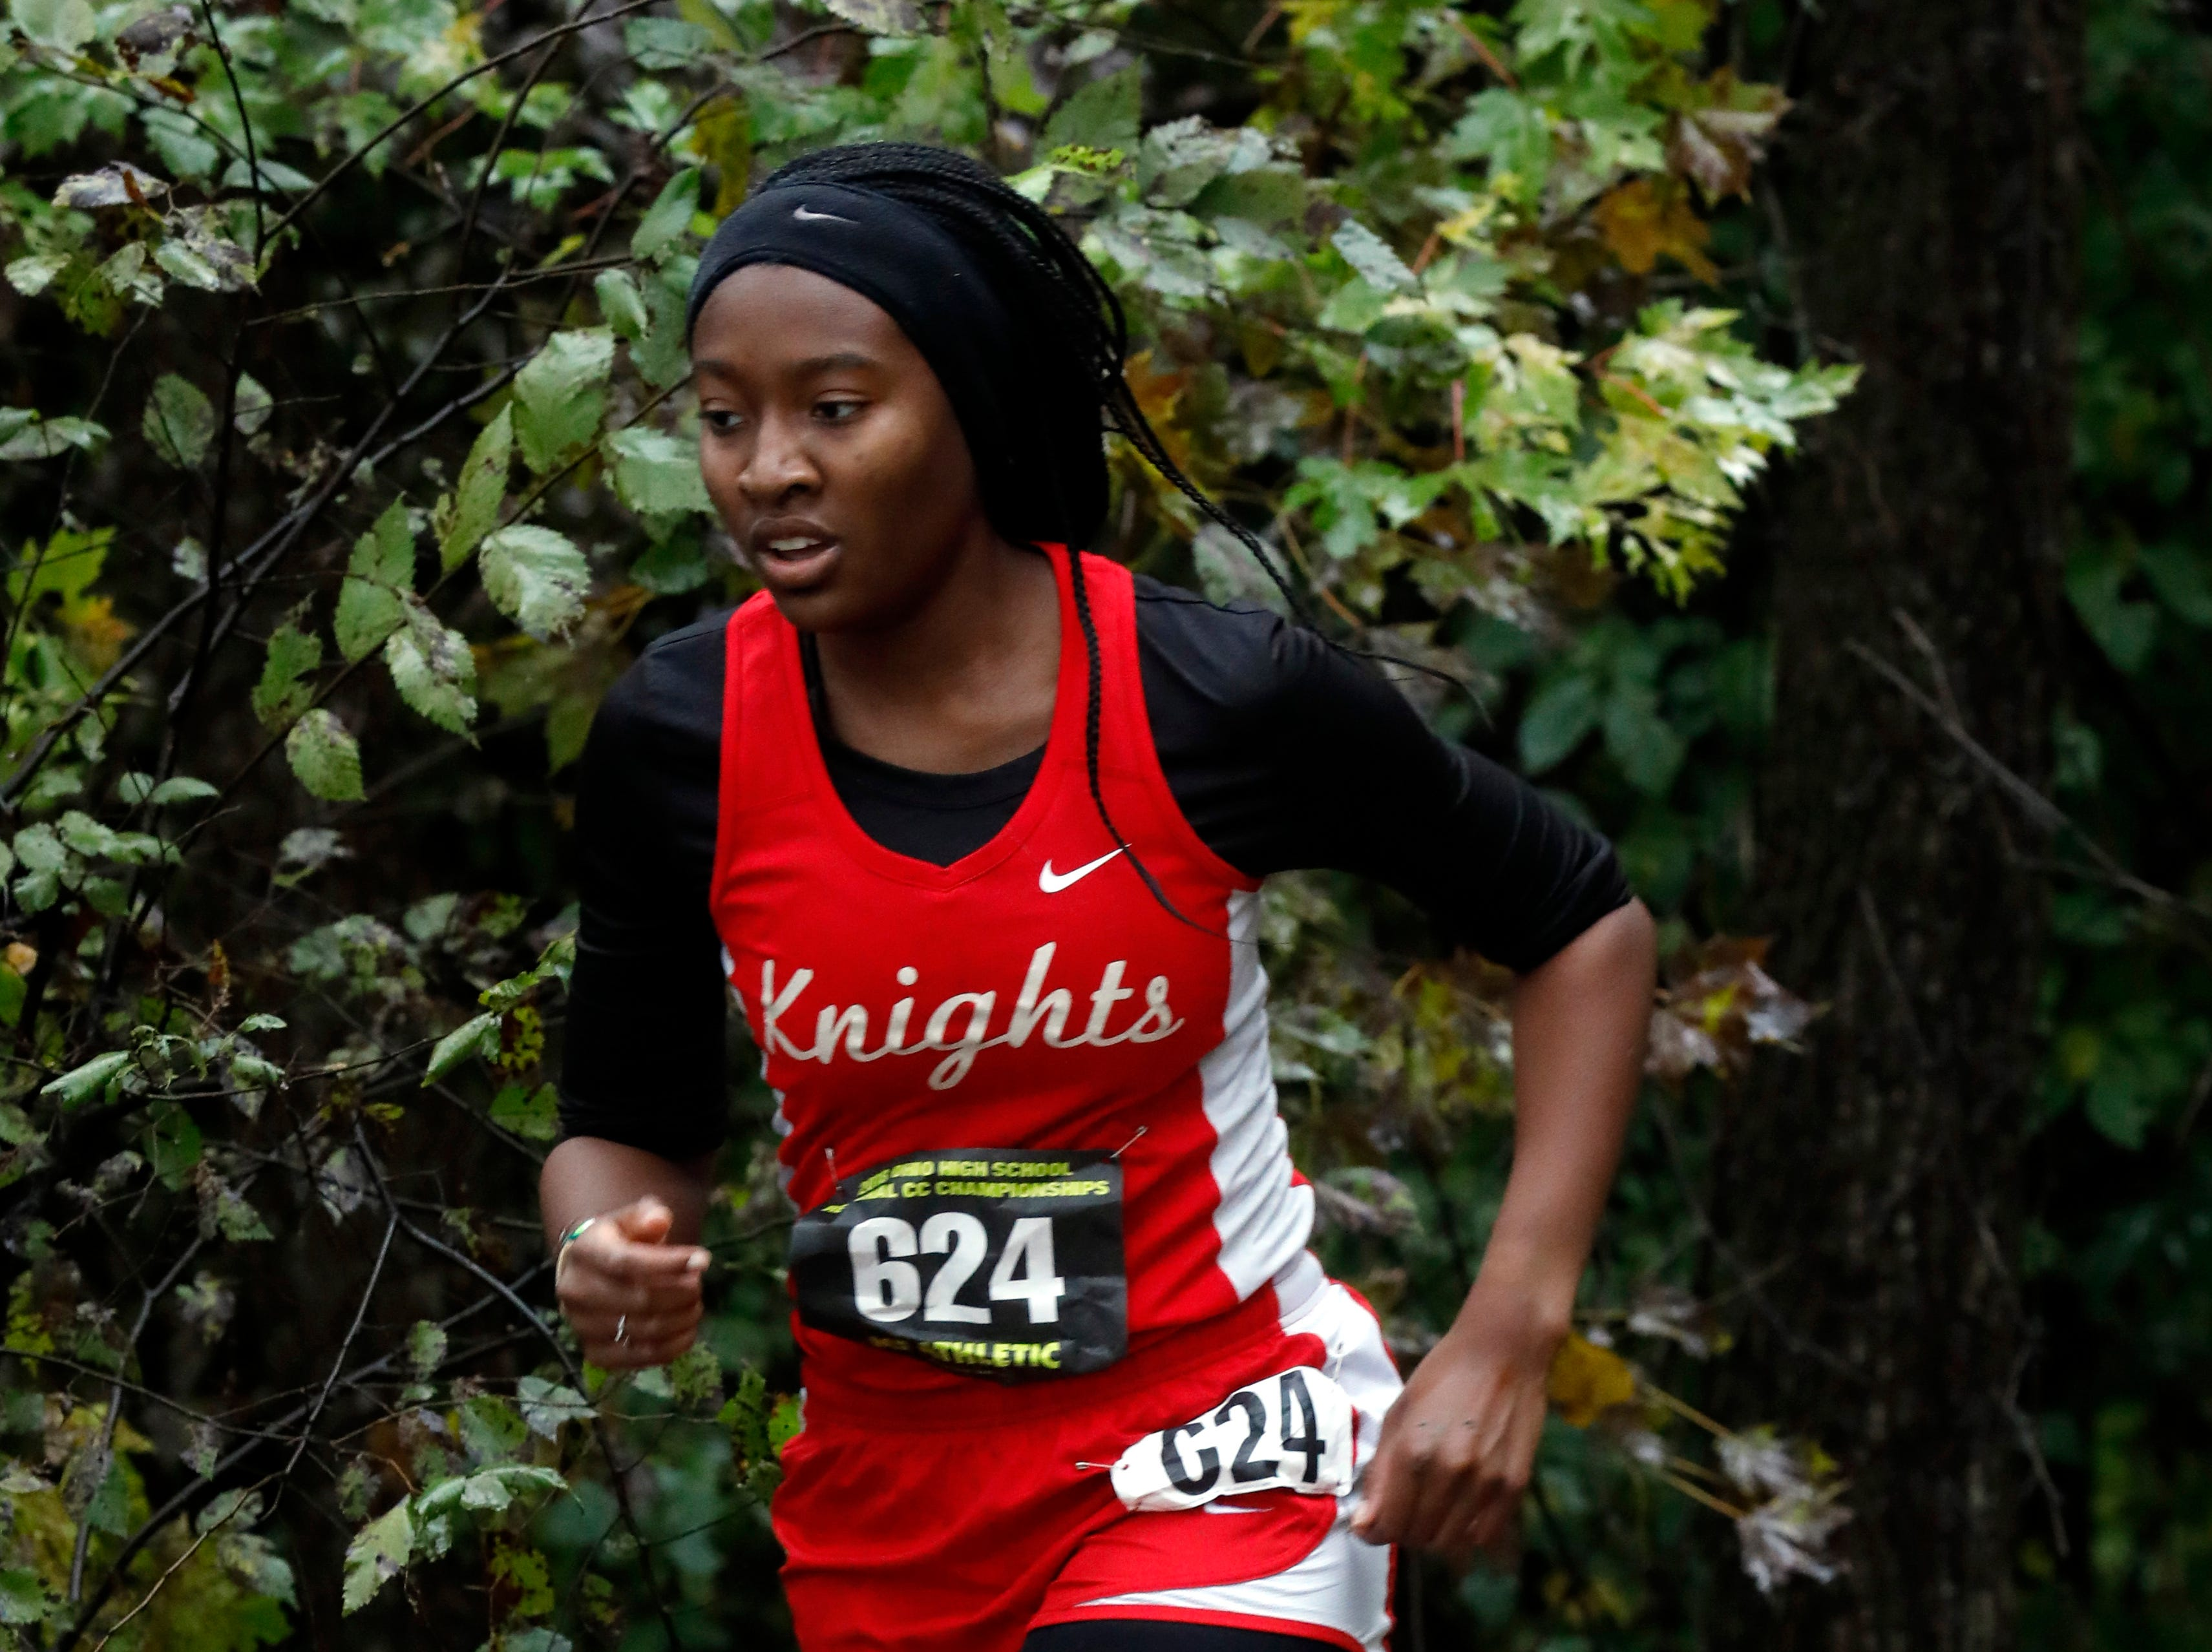 Fairfield Christian's Maame Adu runs in the Regional Cross Country meet Saturday, Oct. 27, 2018, at Pickerington North High School in Pickerington.